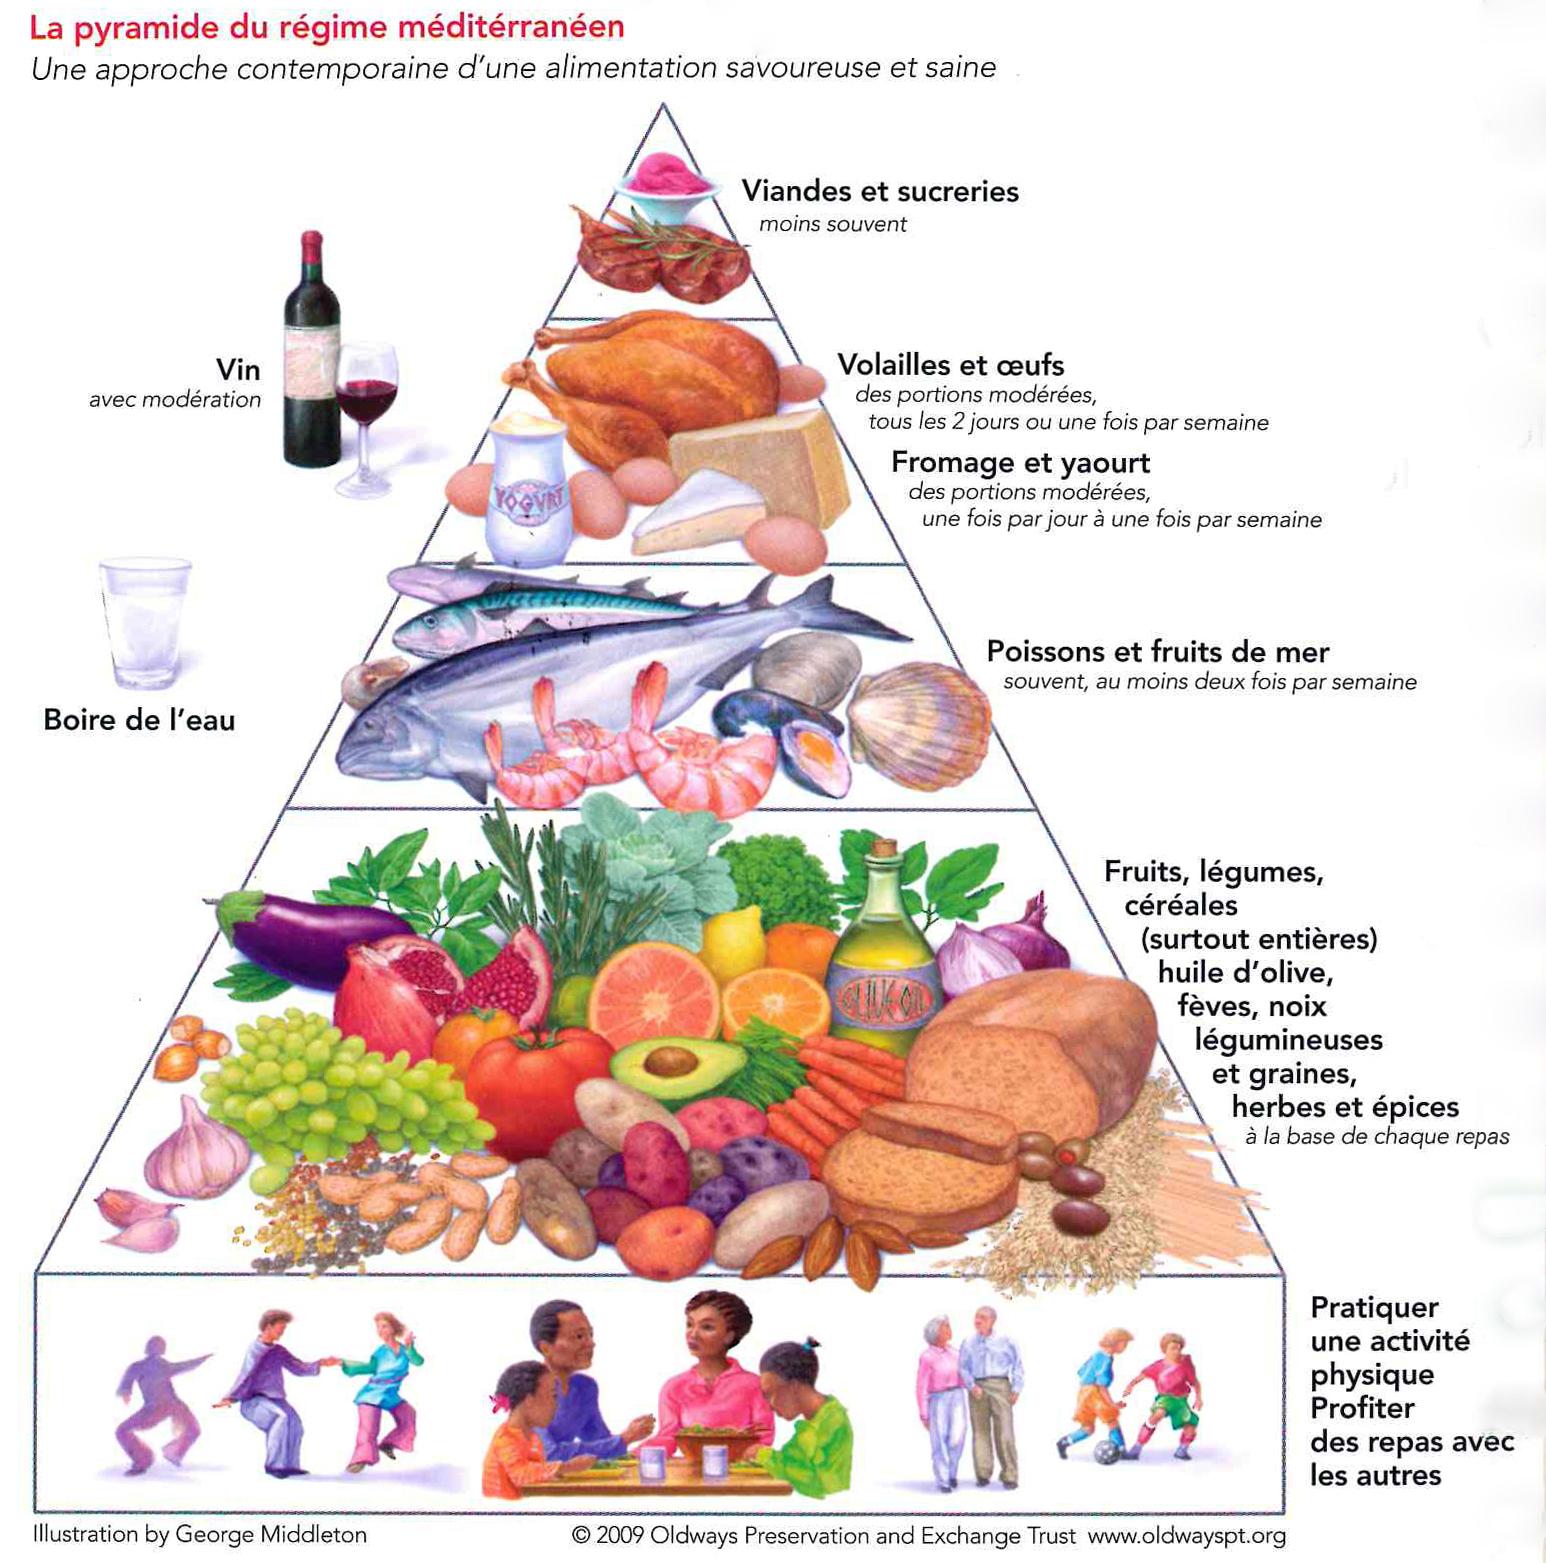 ostéoporose et alimentation